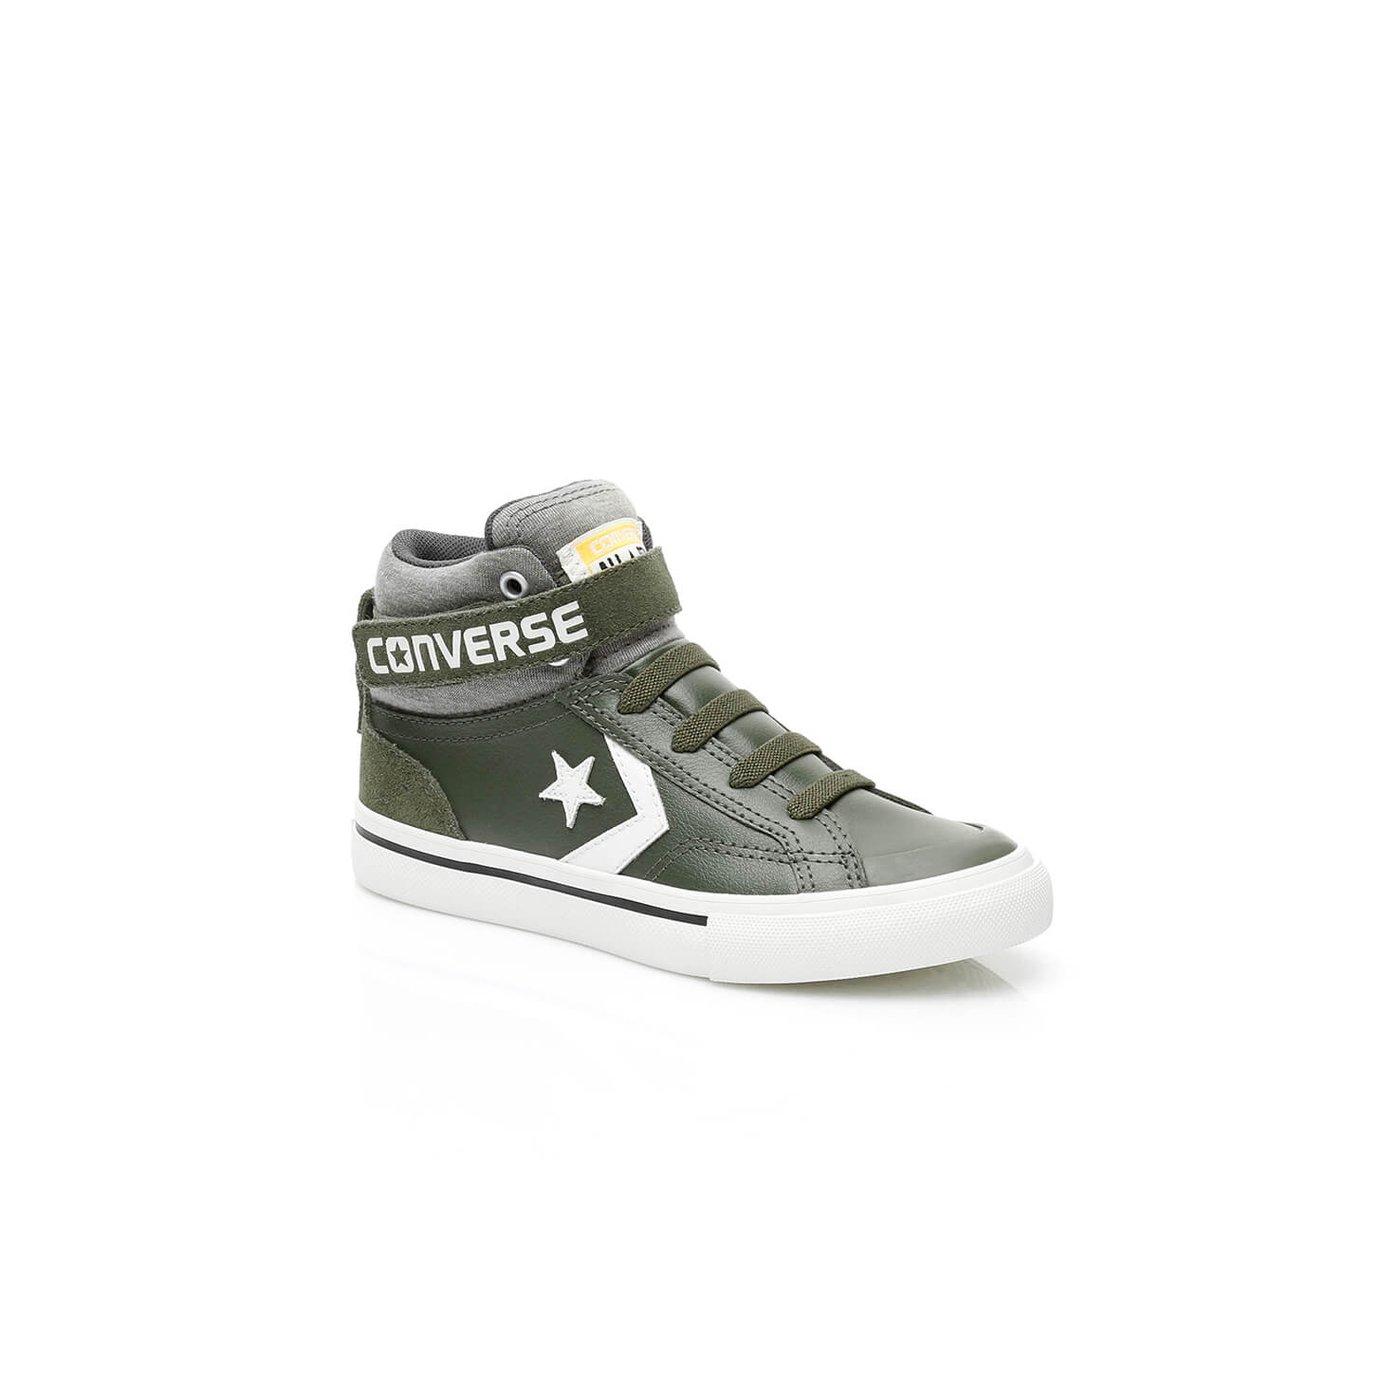 Converse Pro Blaze Strap Stretch Çocuk Yeşil Sneaker